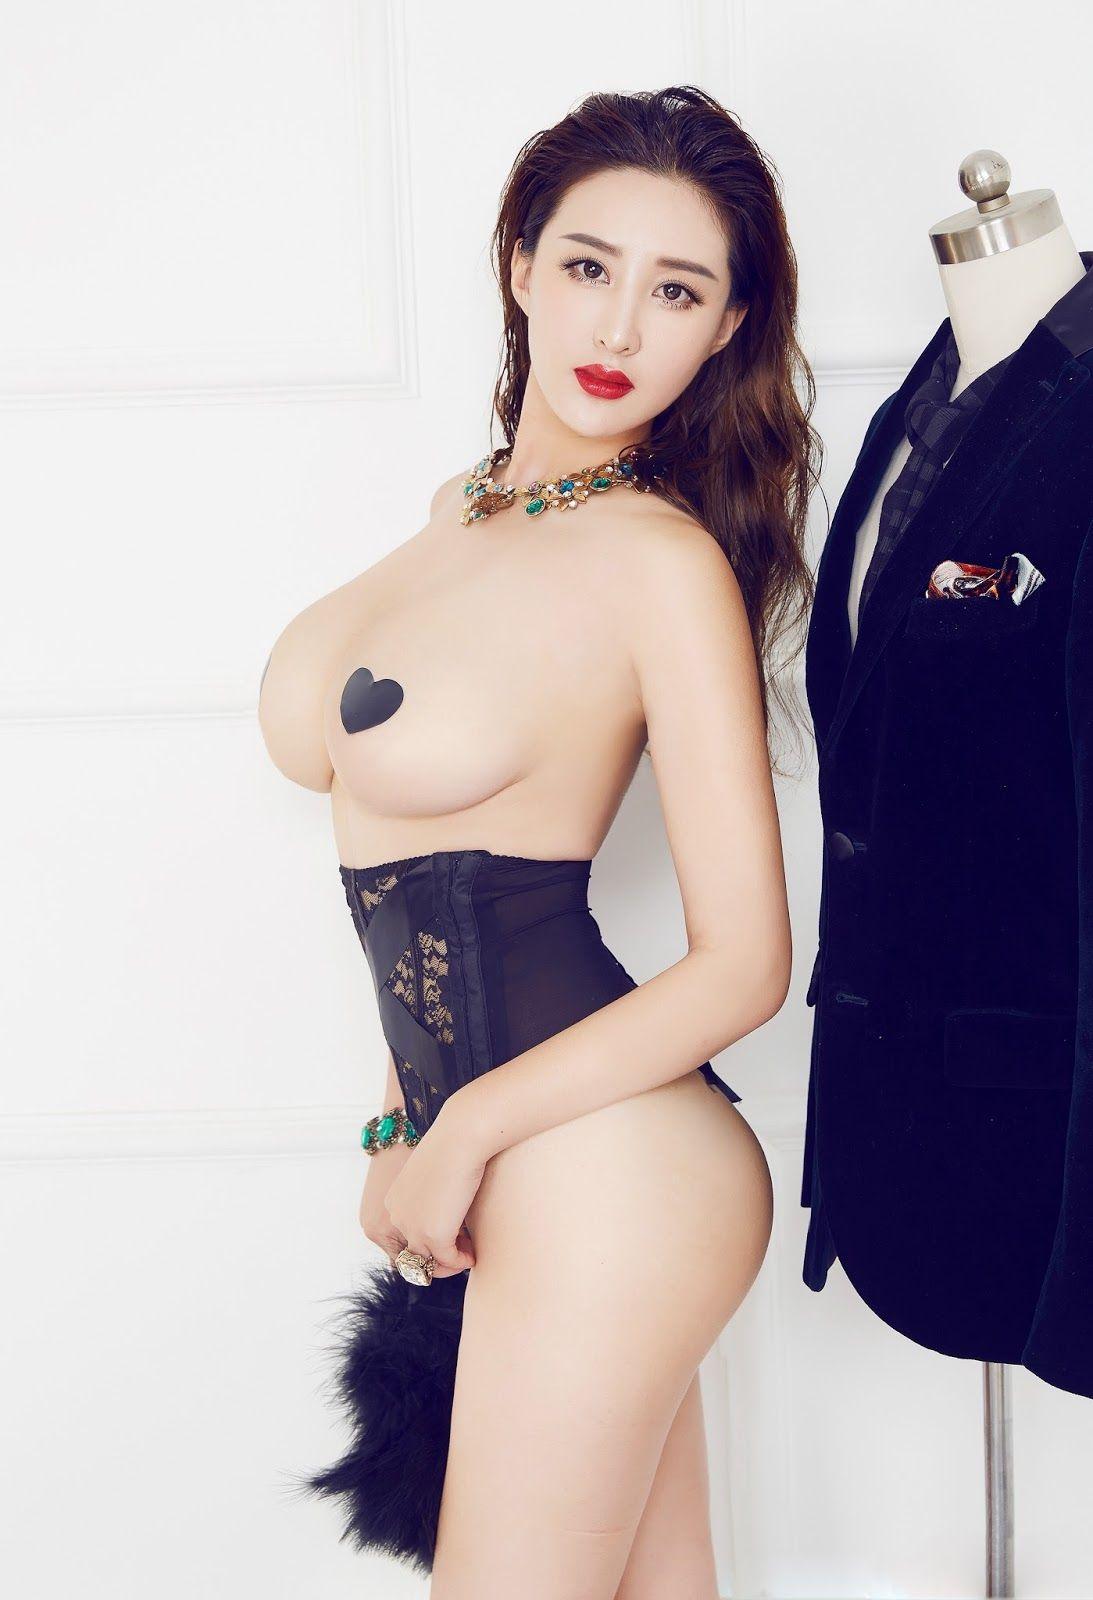 Monica belucci nude video